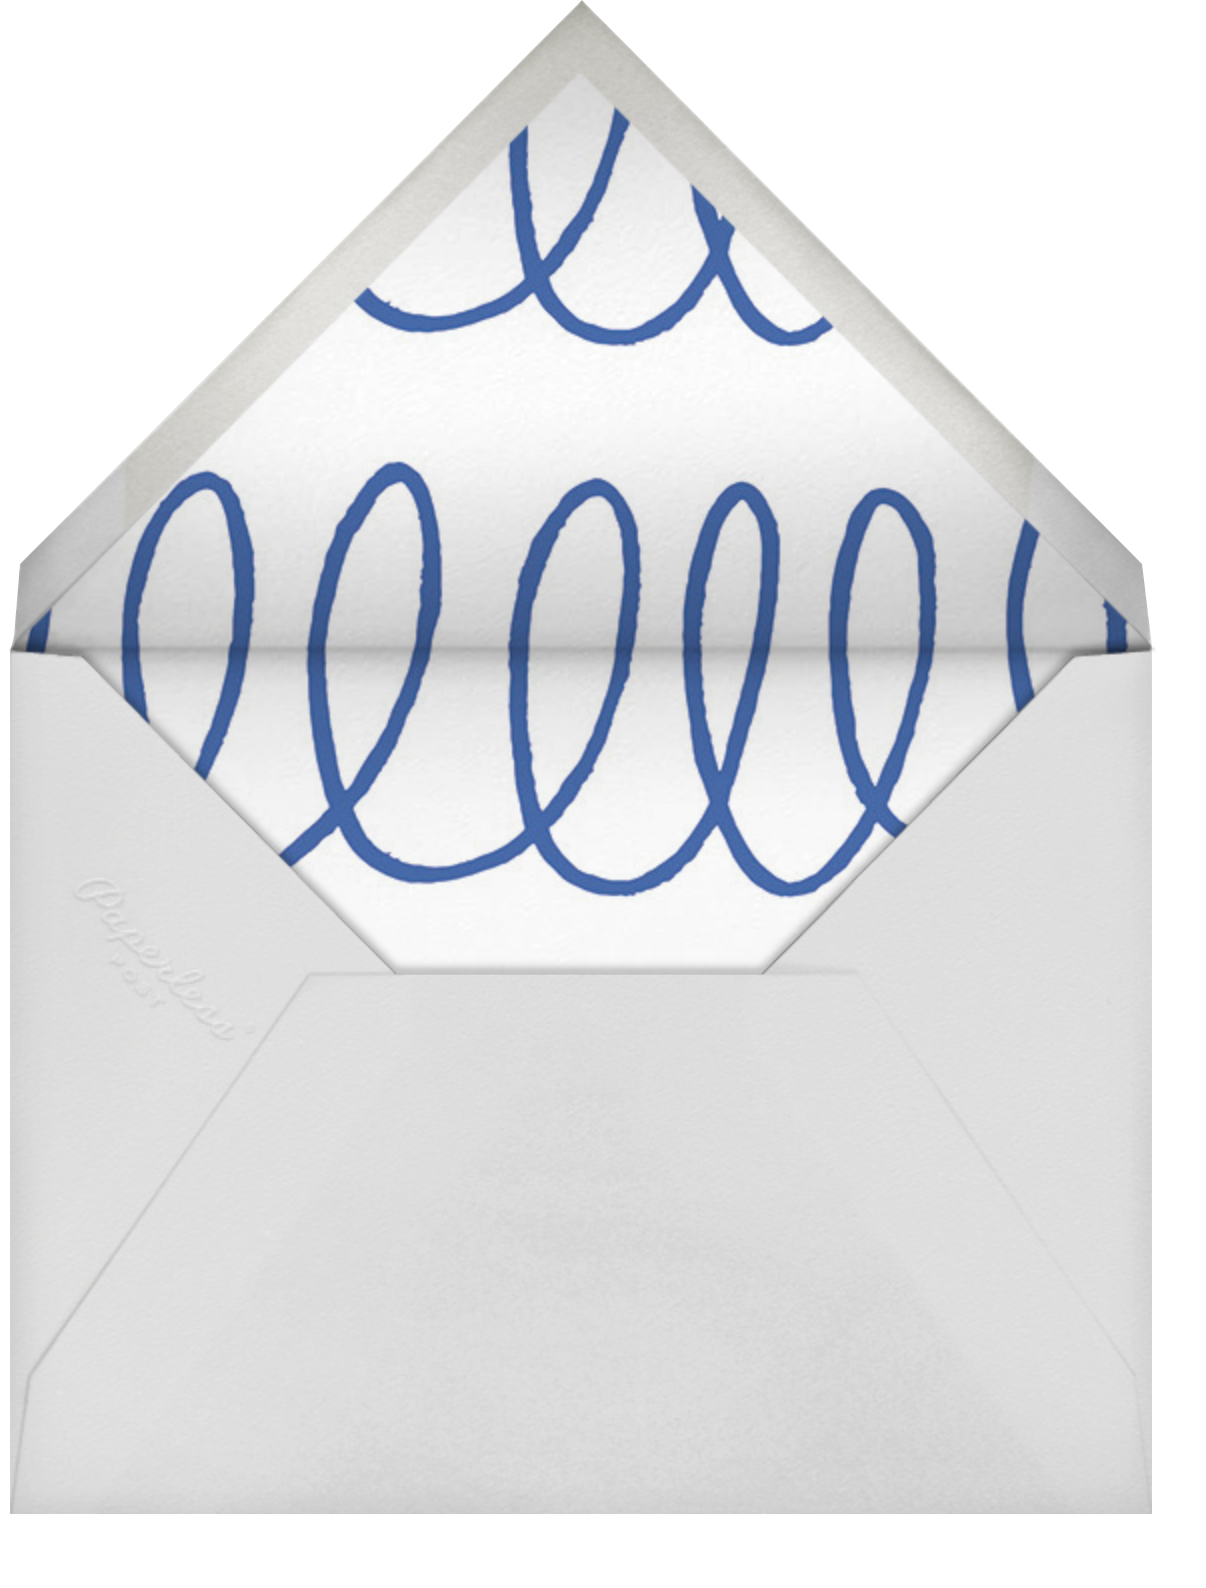 Charlotte Street II (Stationery) - Blue - kate spade new york - Wedding - envelope back